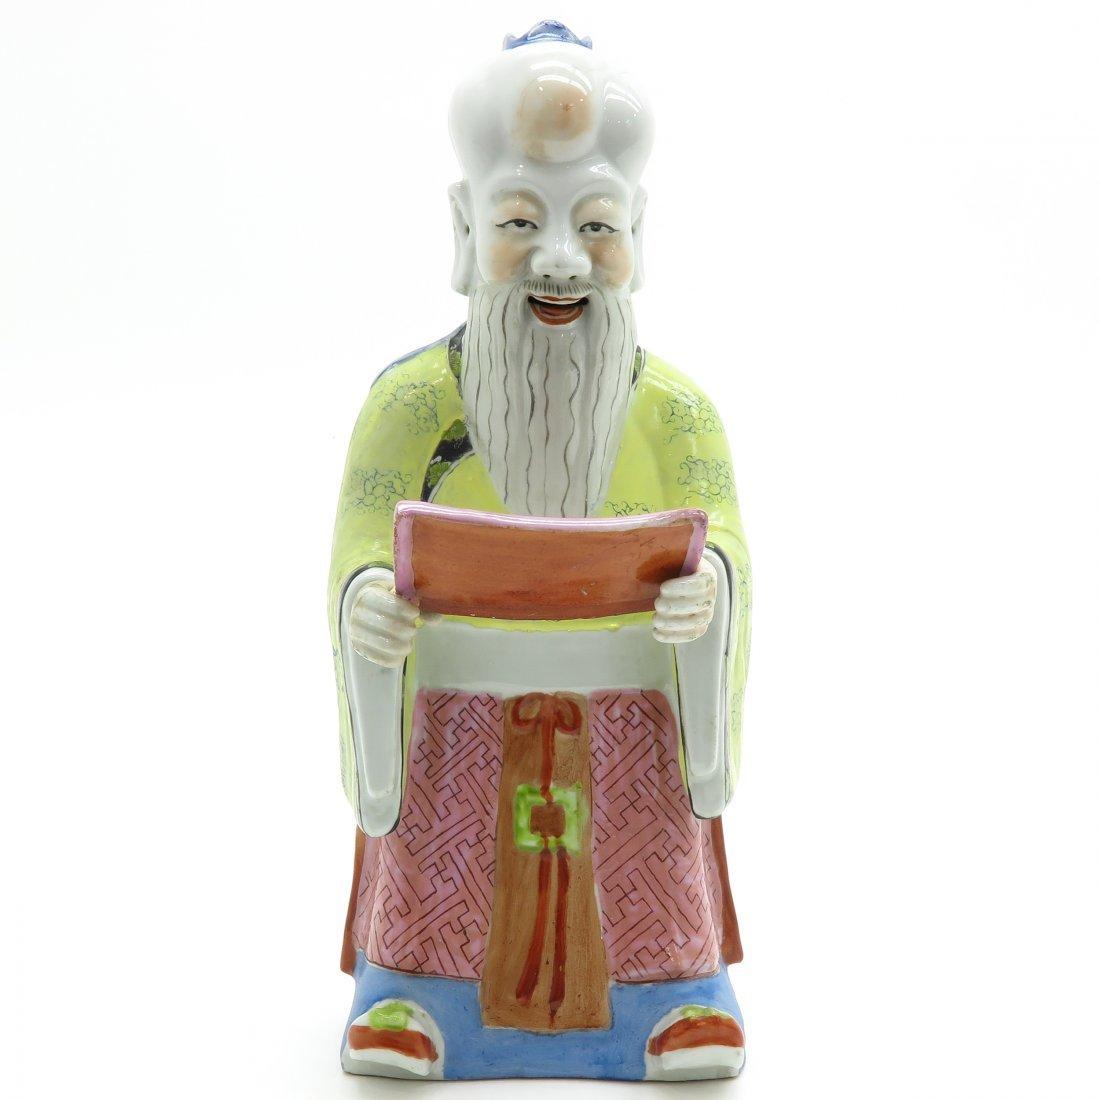 China Porcelain Sculpture Depicting Philosopher